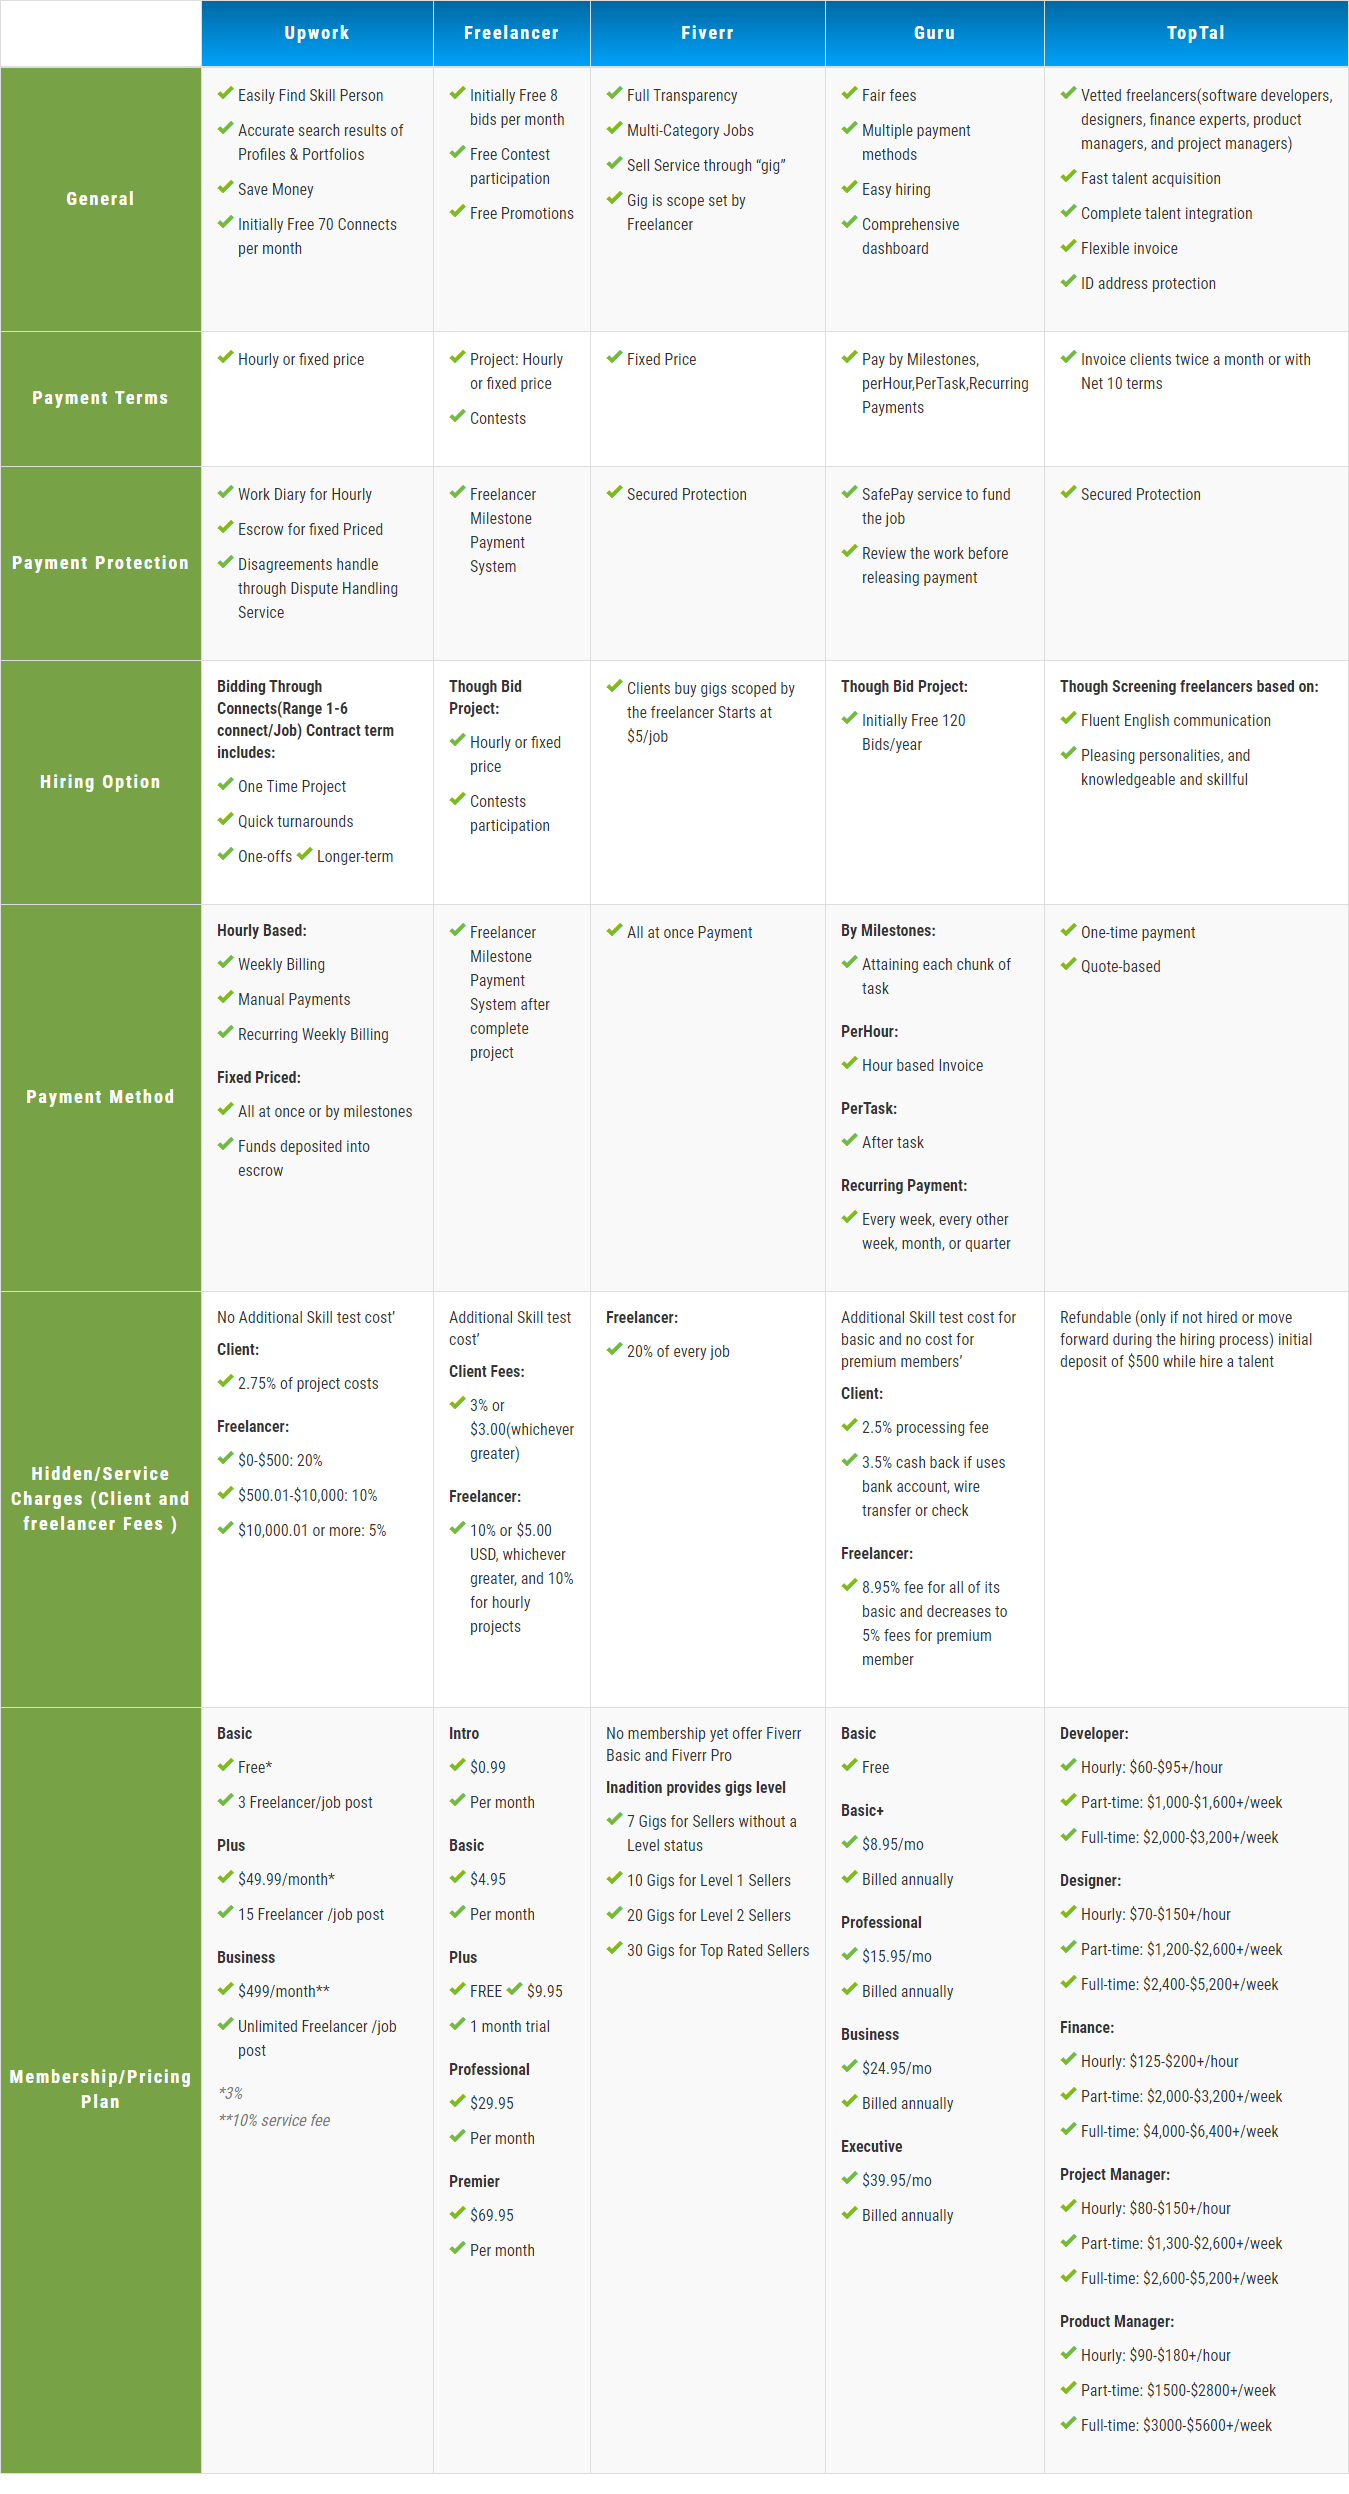 Freelance Platform Research Data